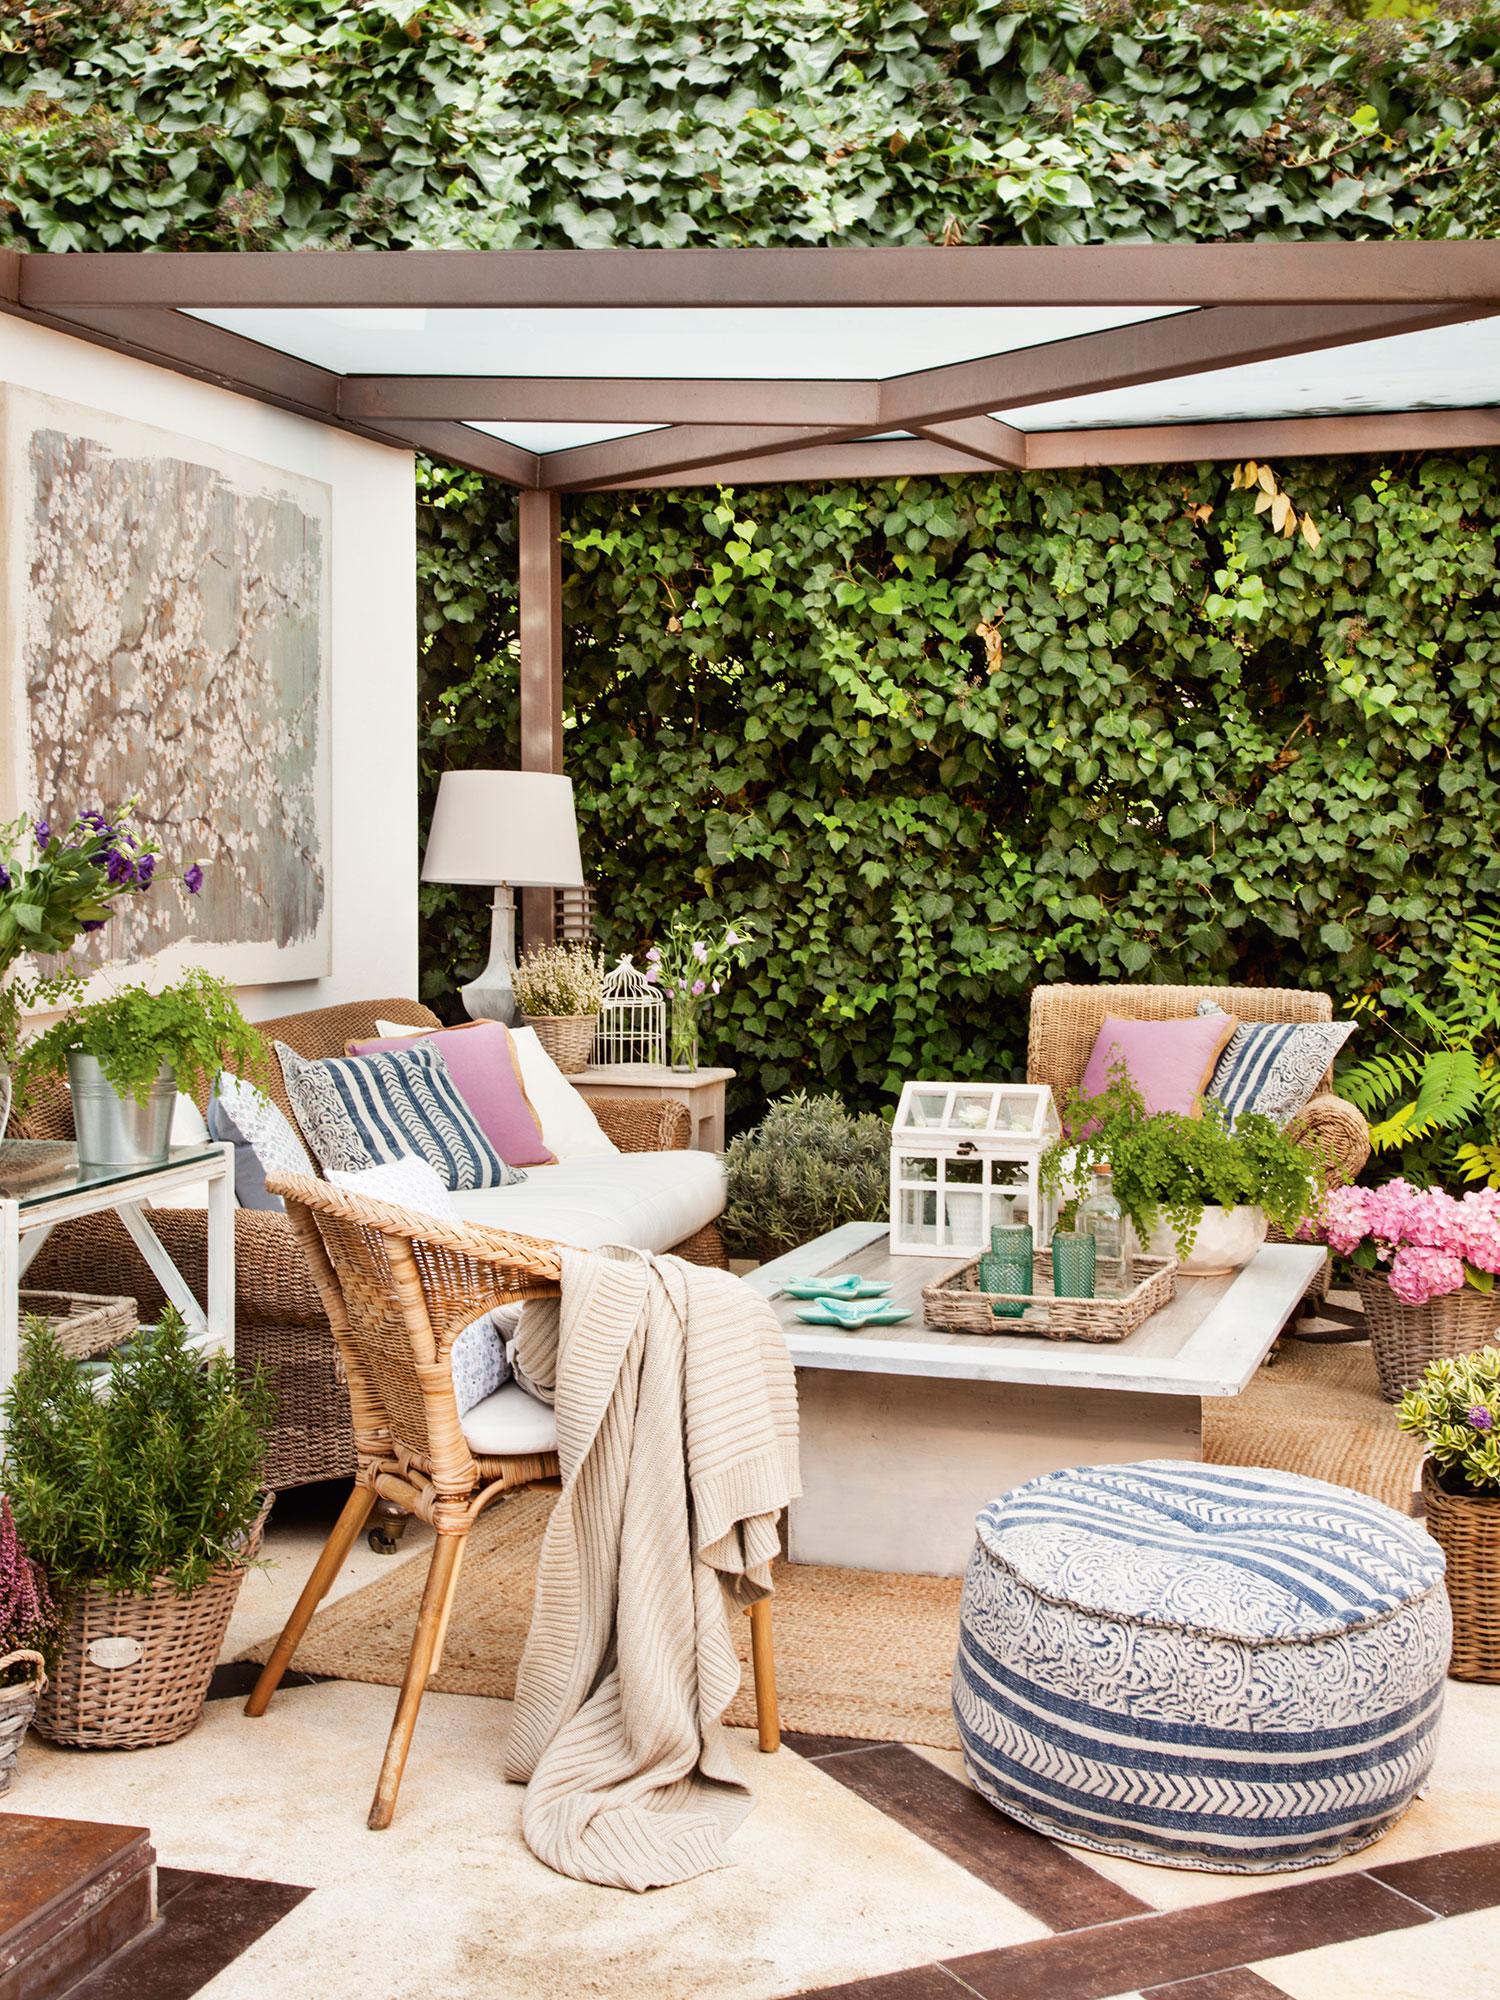 9ce07f3fc Salón de verano en terraza con pérgola. A prueba de frío y de calor